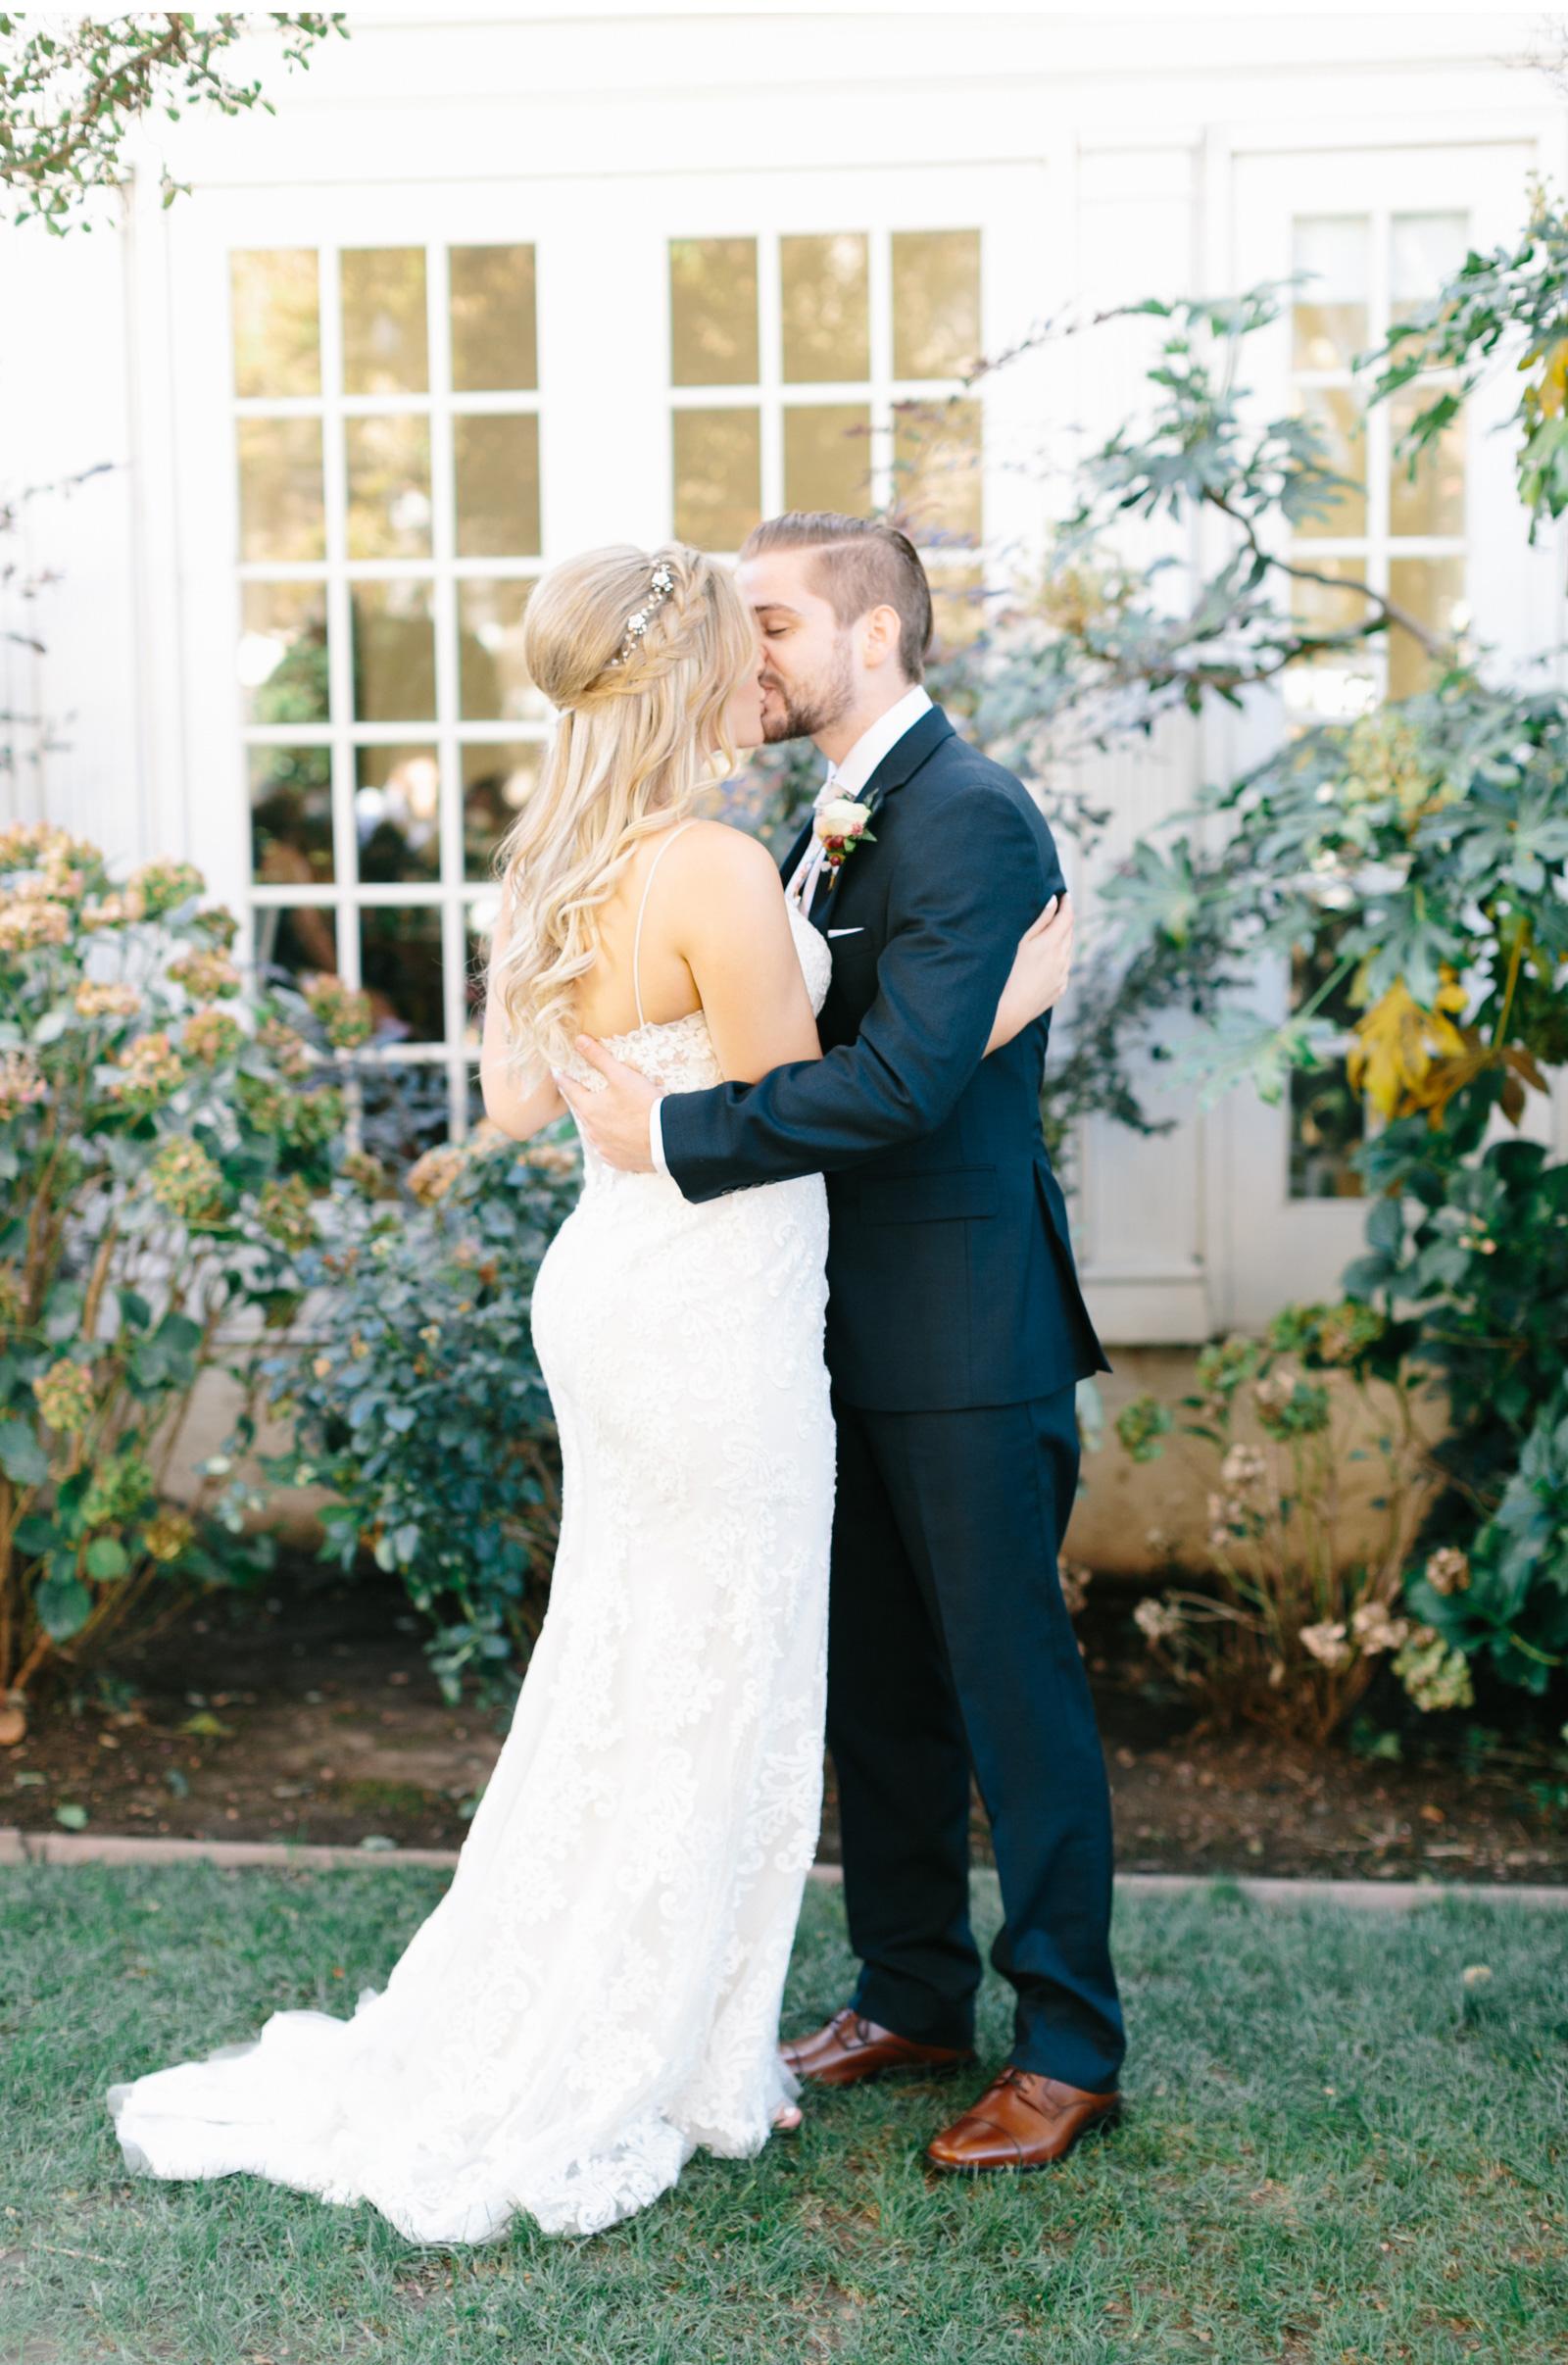 Malibu-Wedding-Photographer-Natalie-Schutt-Photography-Vizcaya_04.jpg